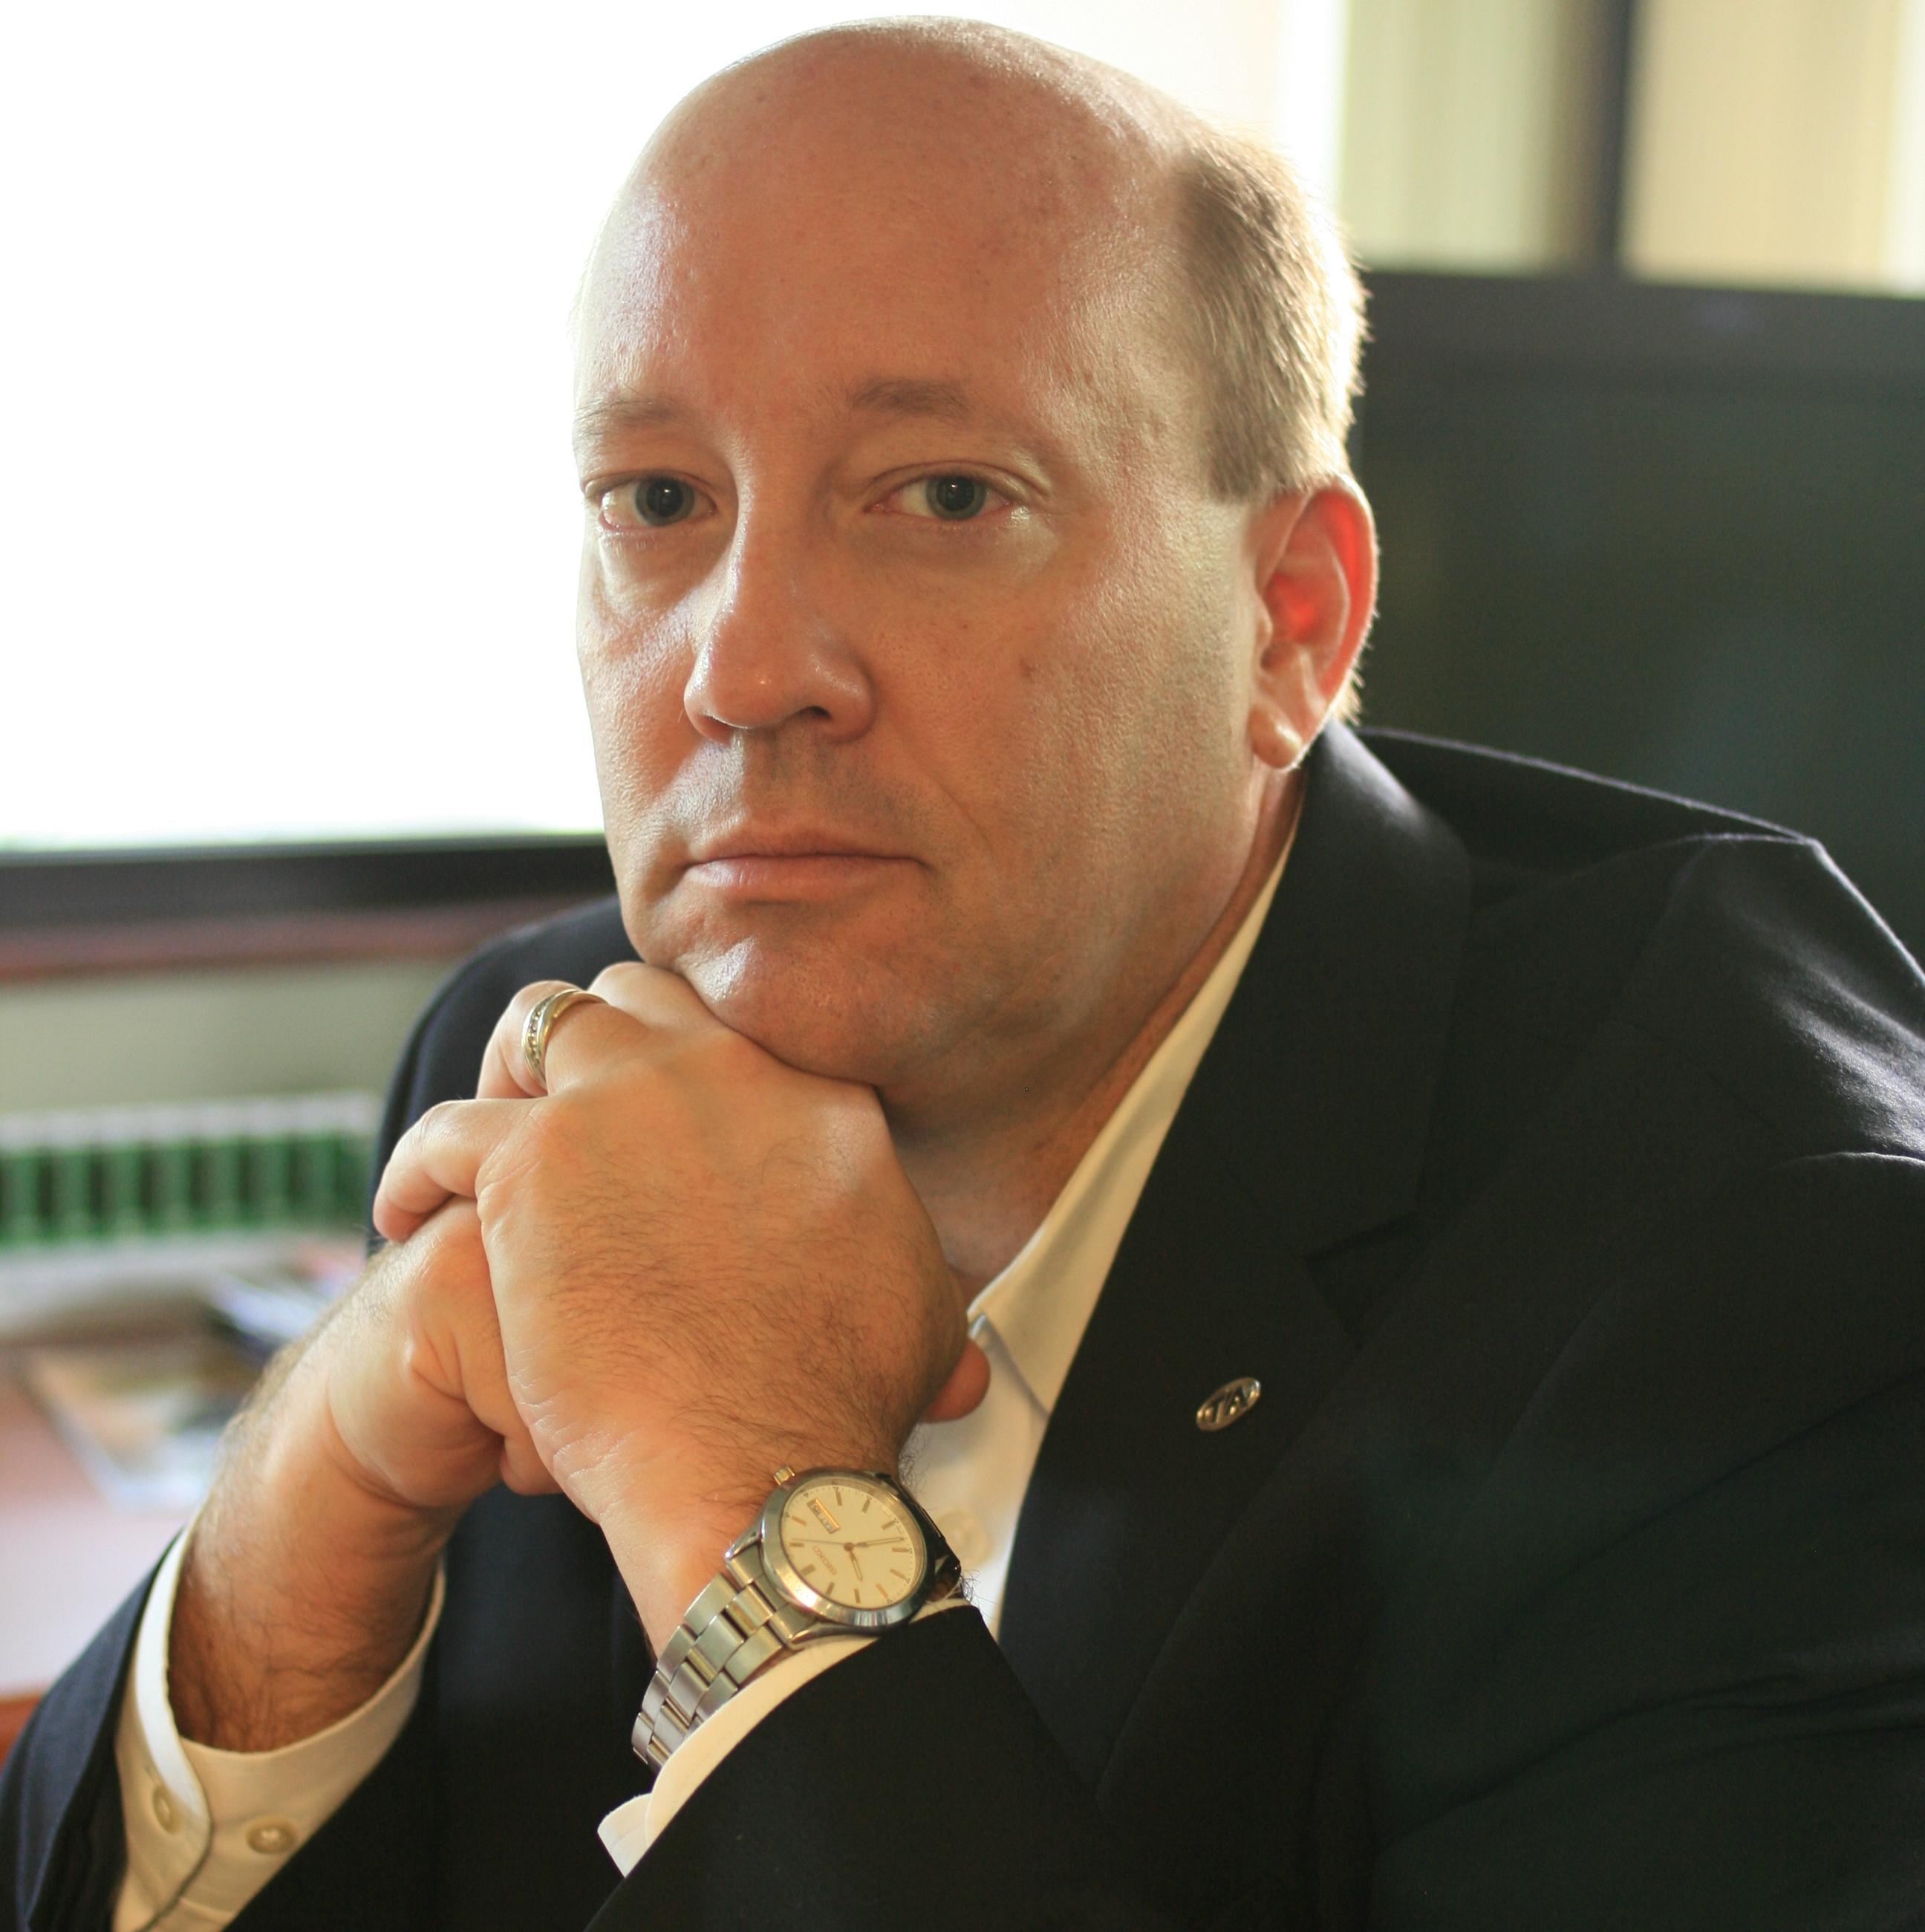 Fred Yentz, president and CEO, Telit IoT Platforms